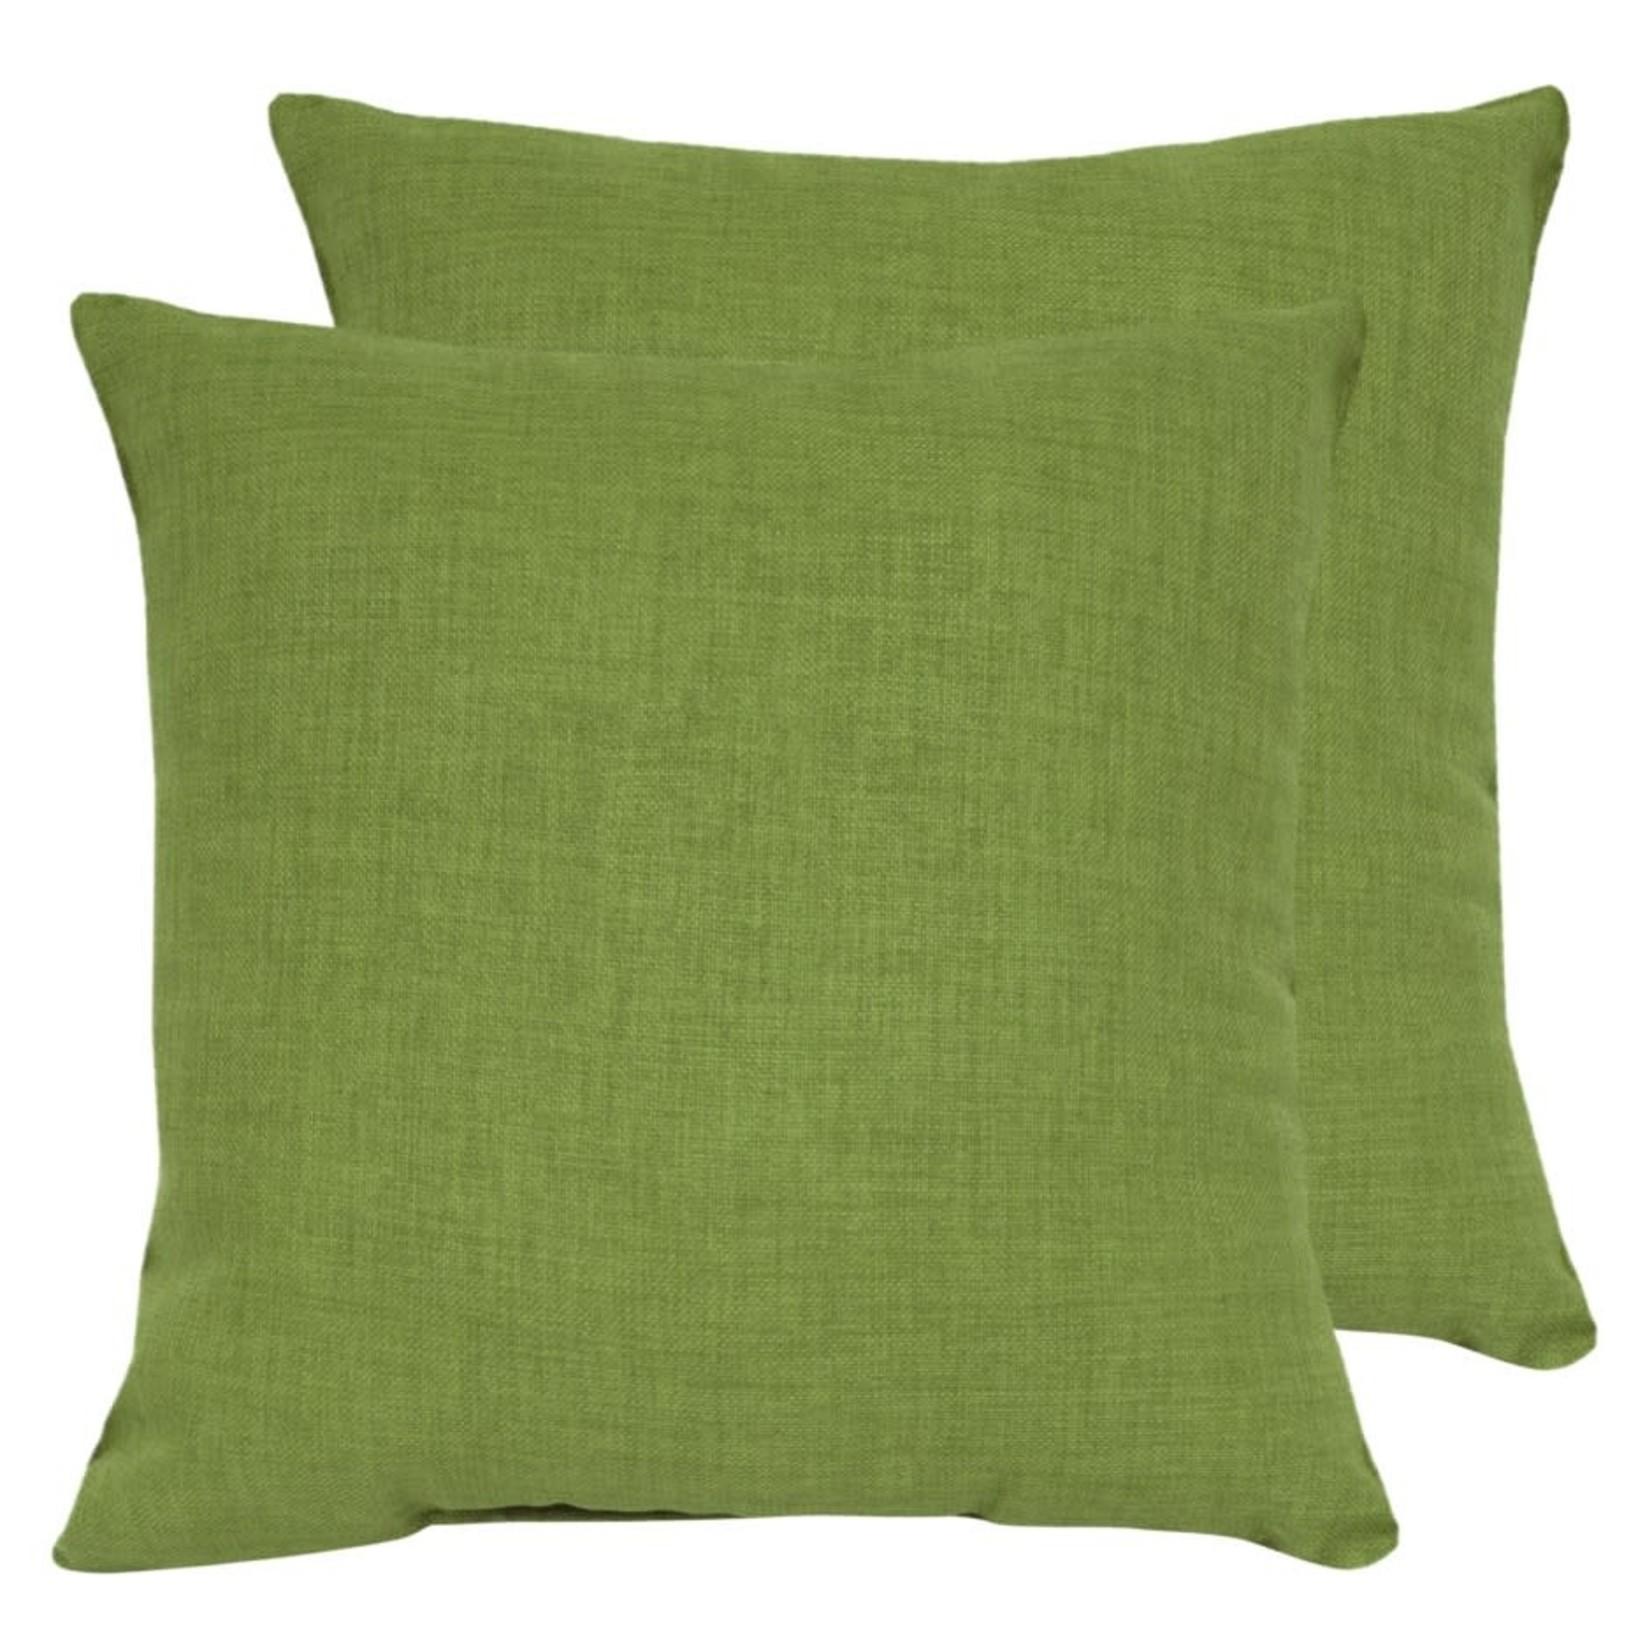 Kelly Green Outdoor Pillow